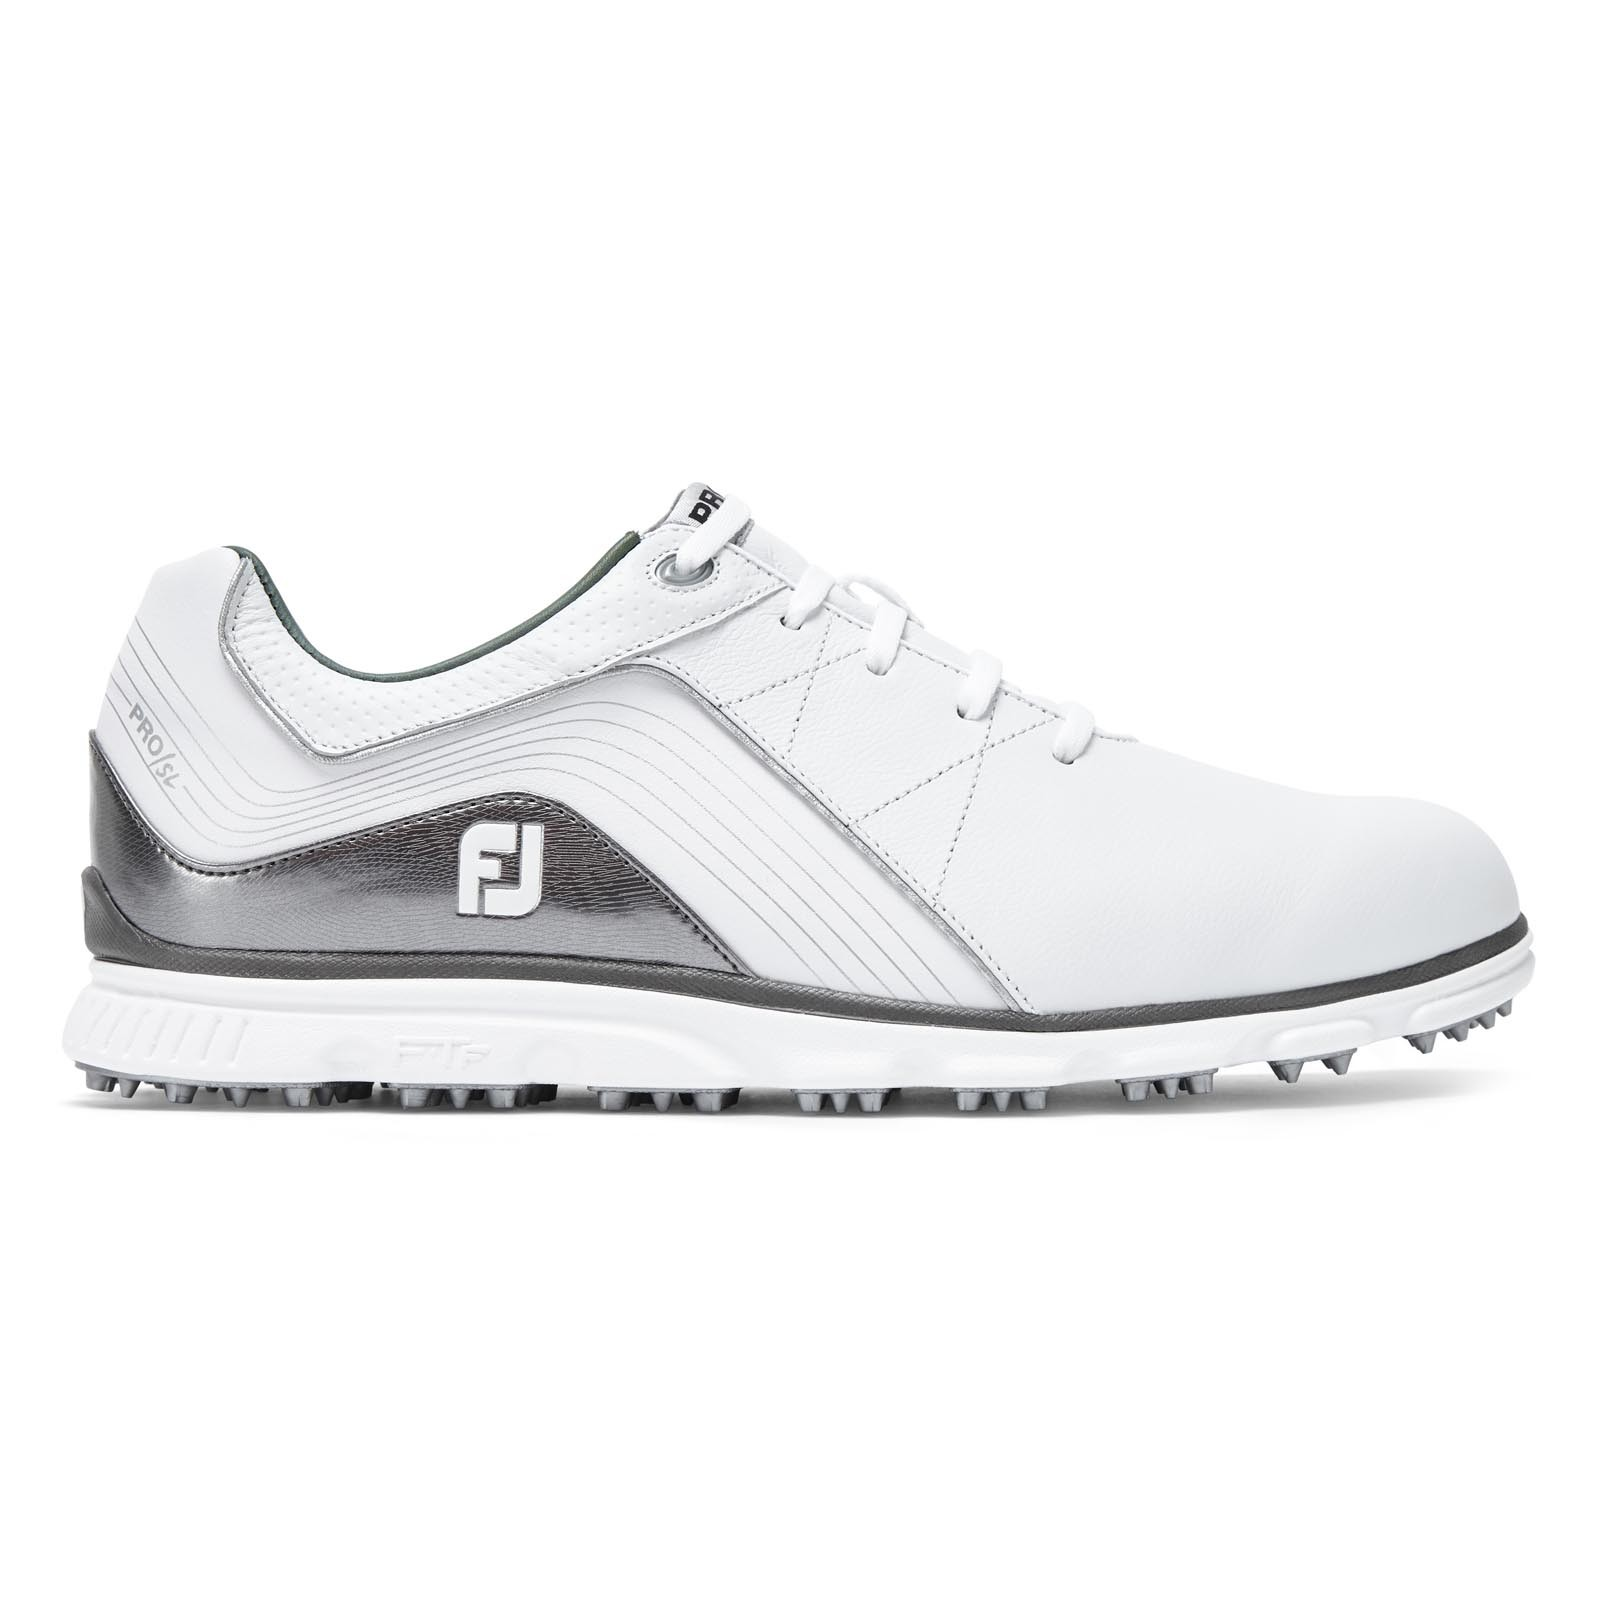 2019 Footjoy Pro/SL Golf Shoes